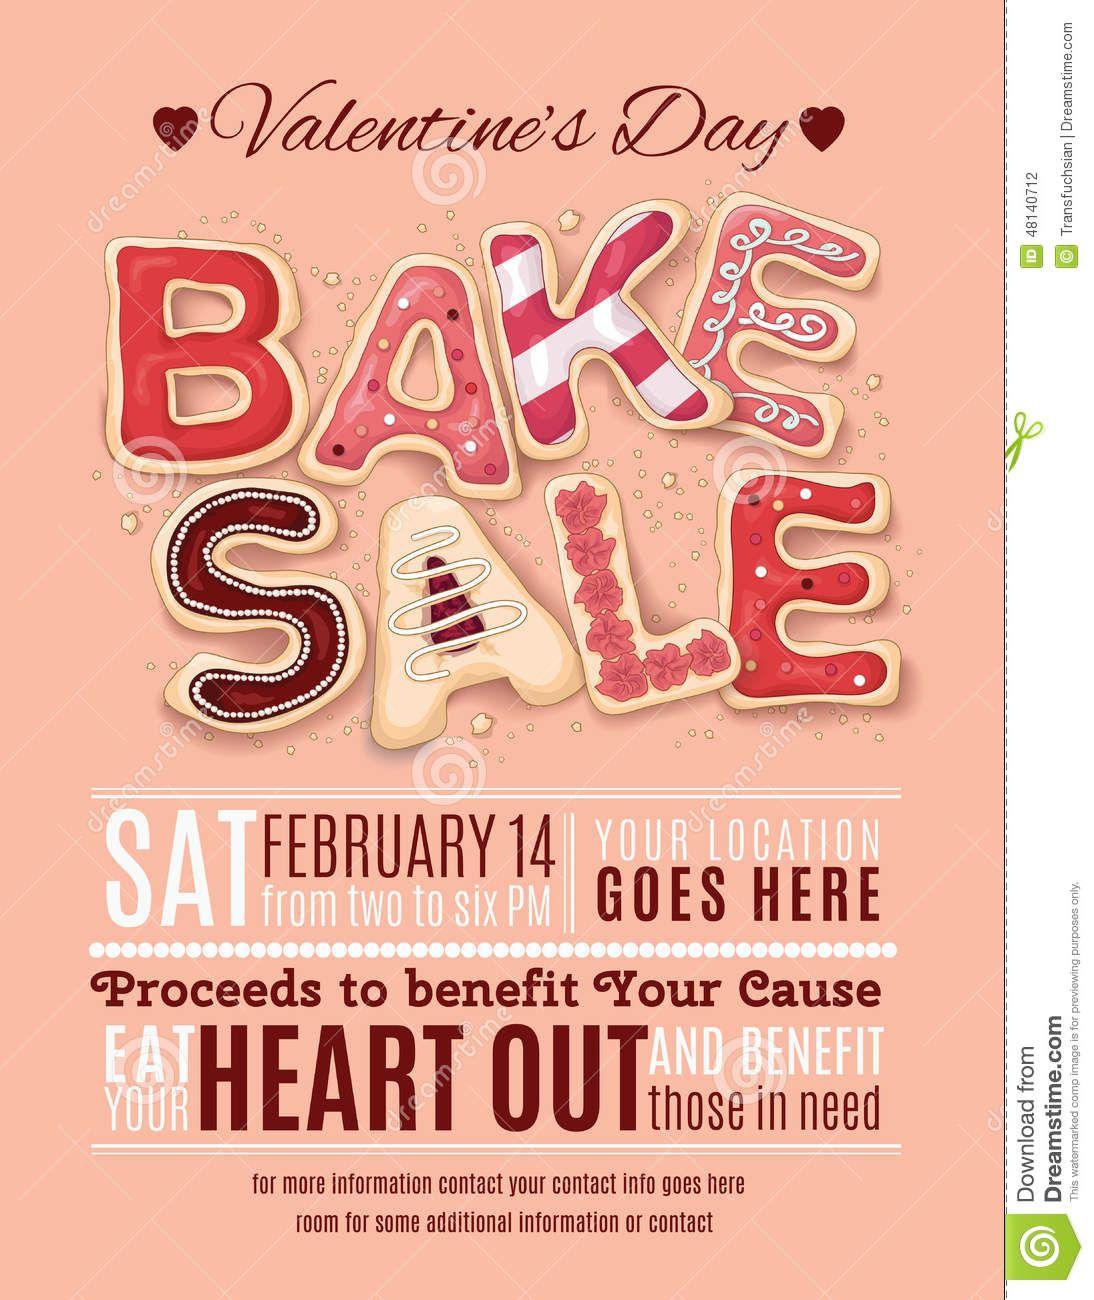 Bake Sale Flyer Templates